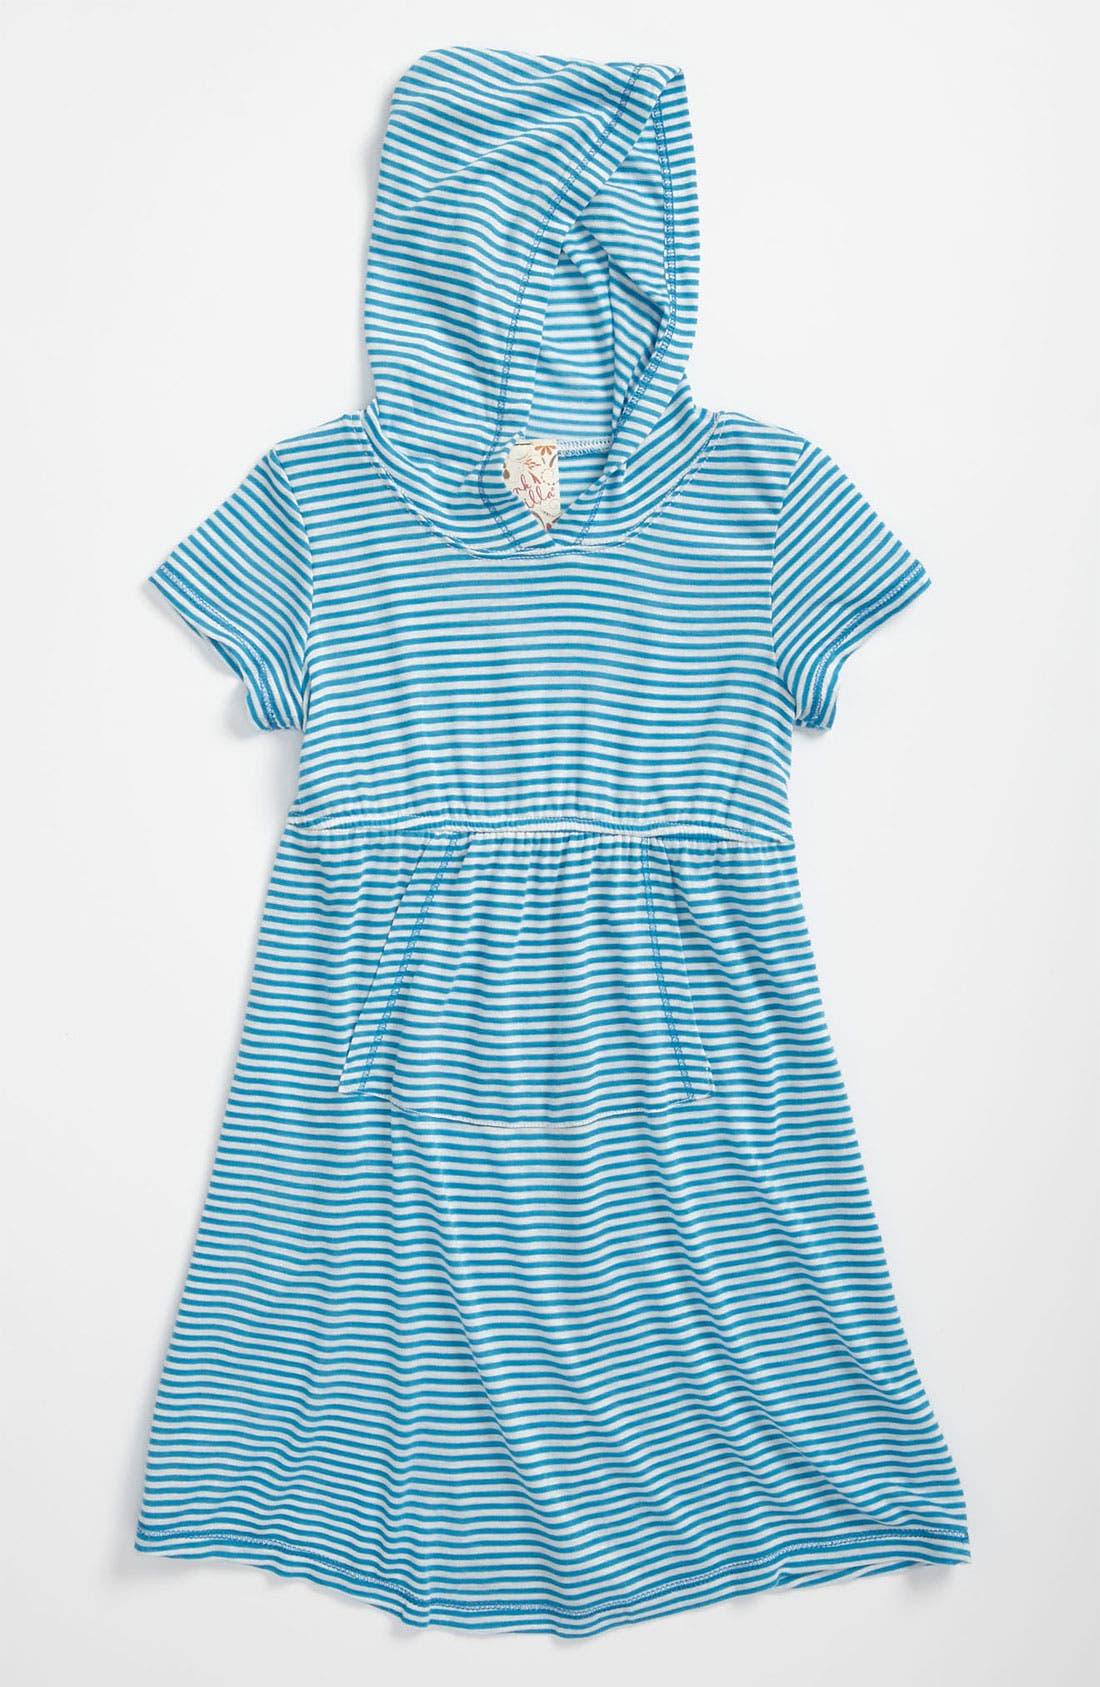 Alternate Image 1 Selected - Pink Vanilla Hooded Stripe Dress (Little Girls)